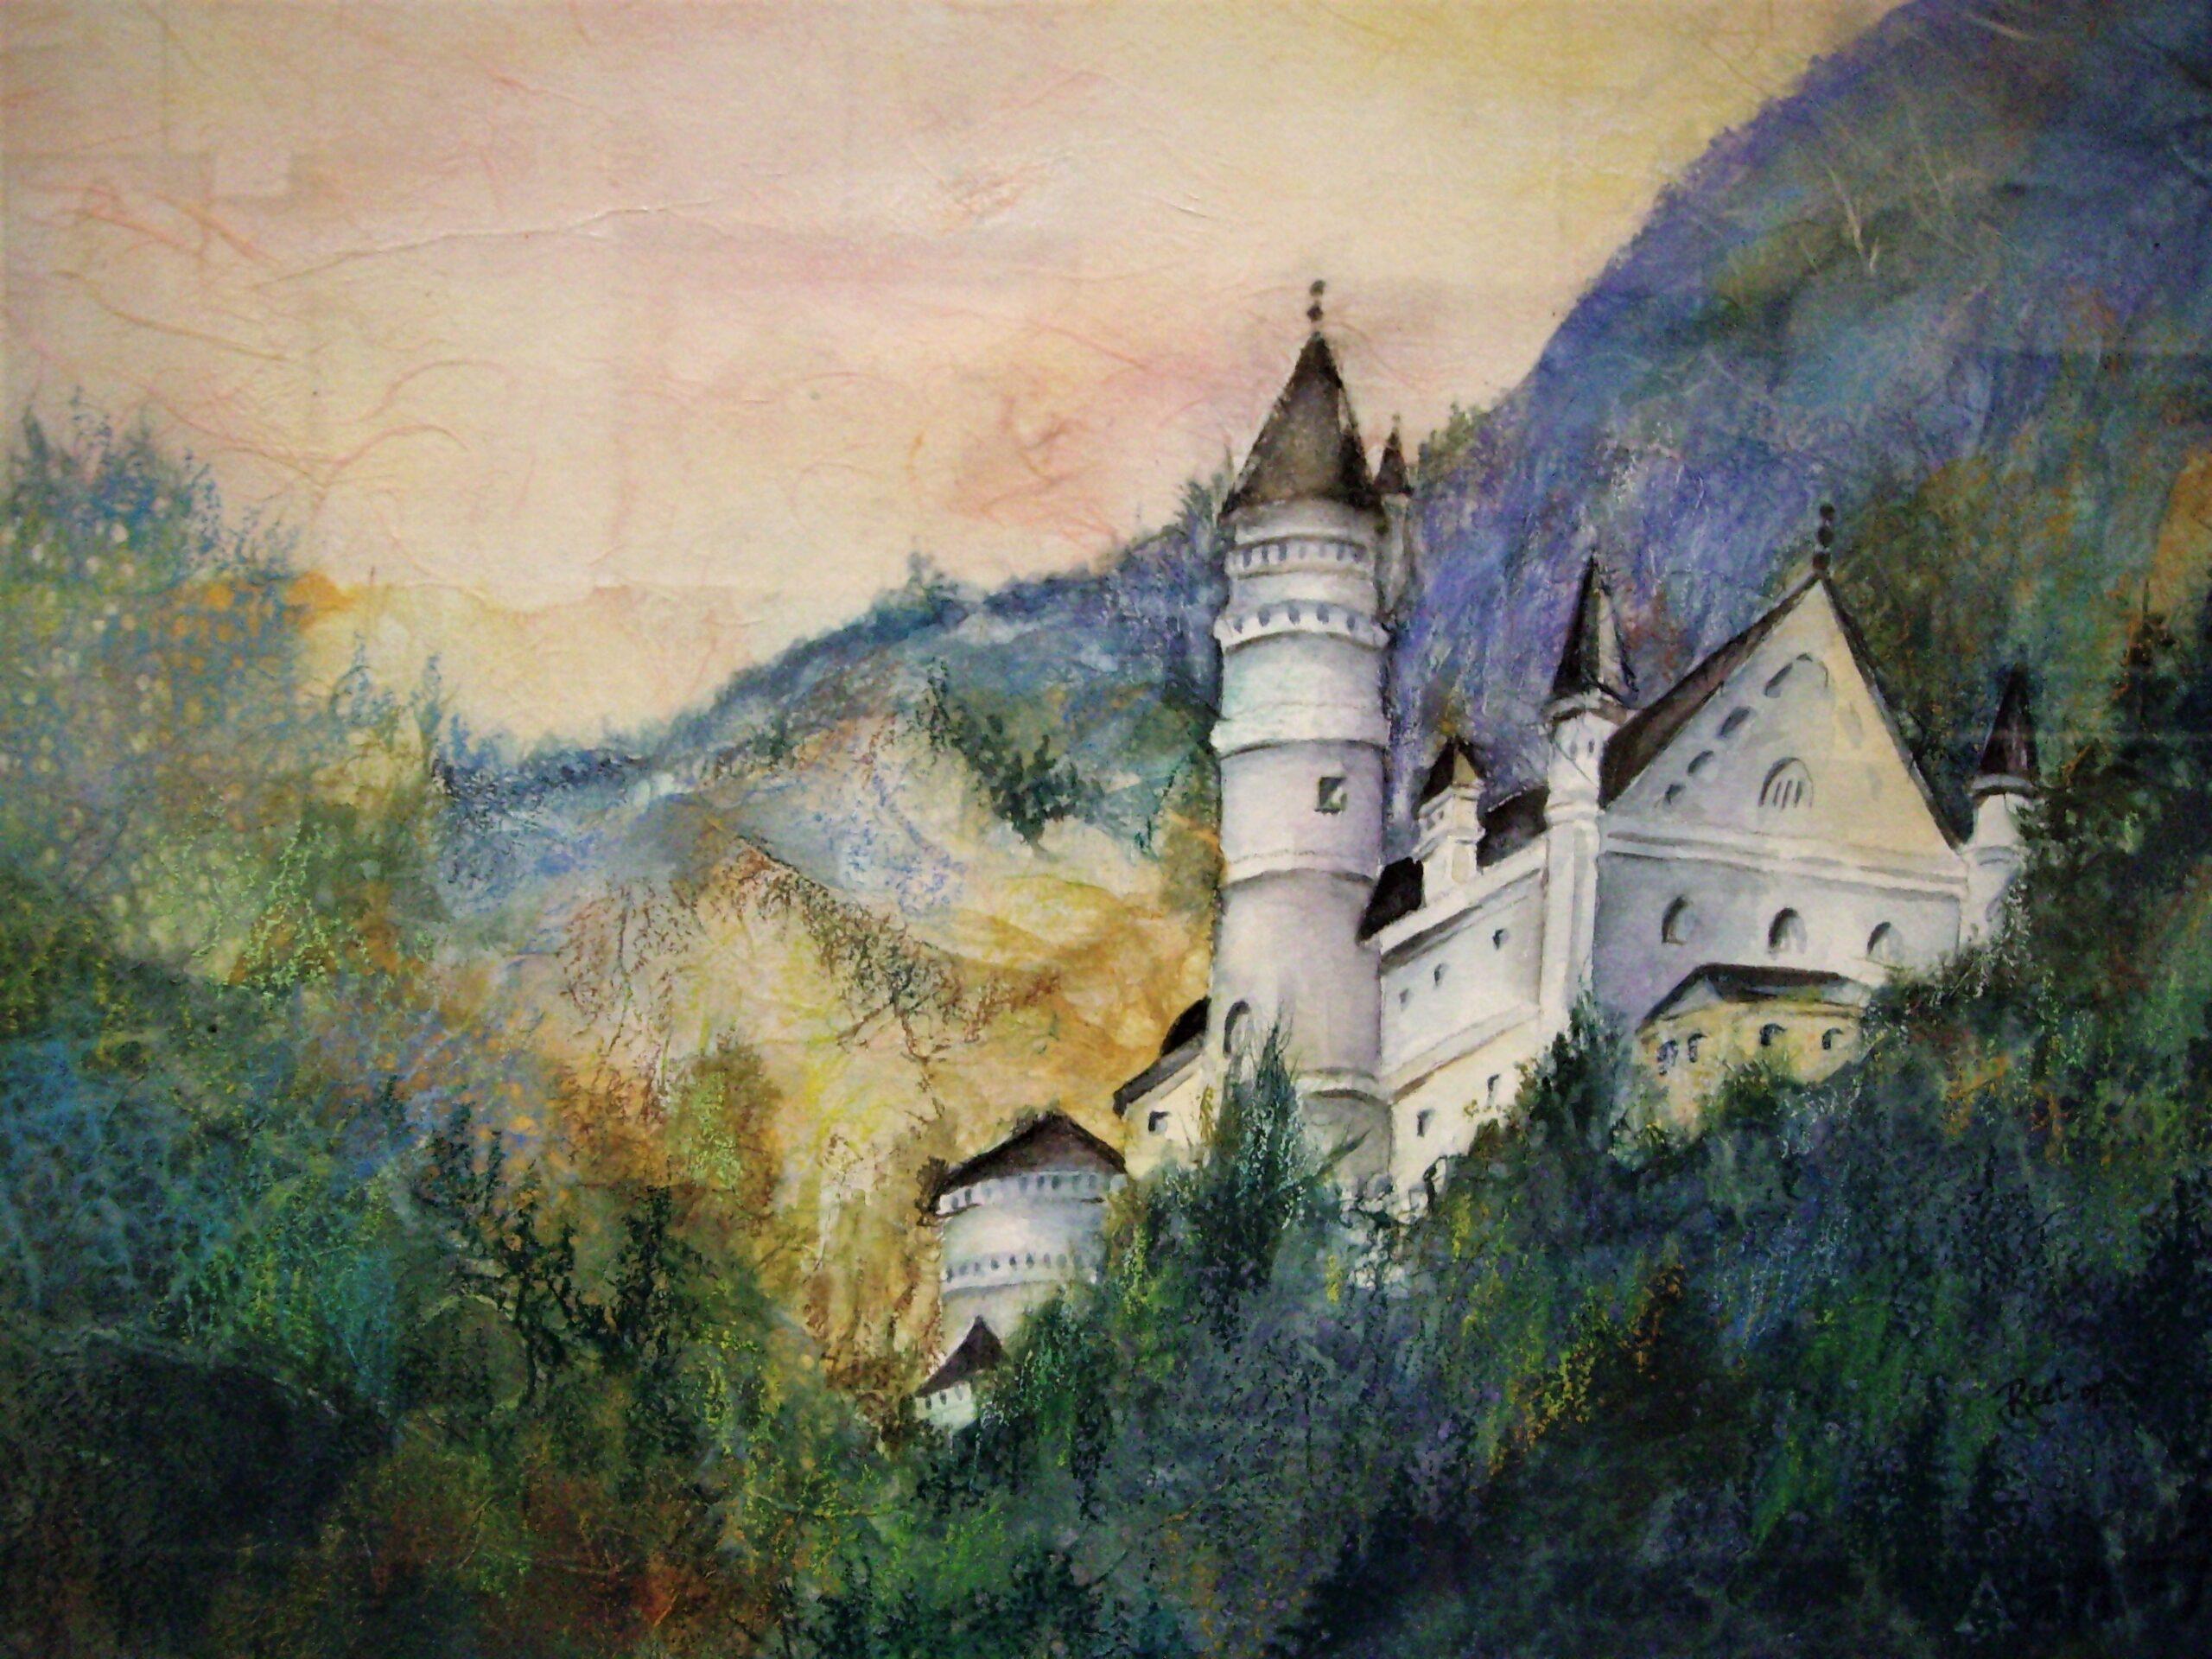 rmc-kings dream-painting